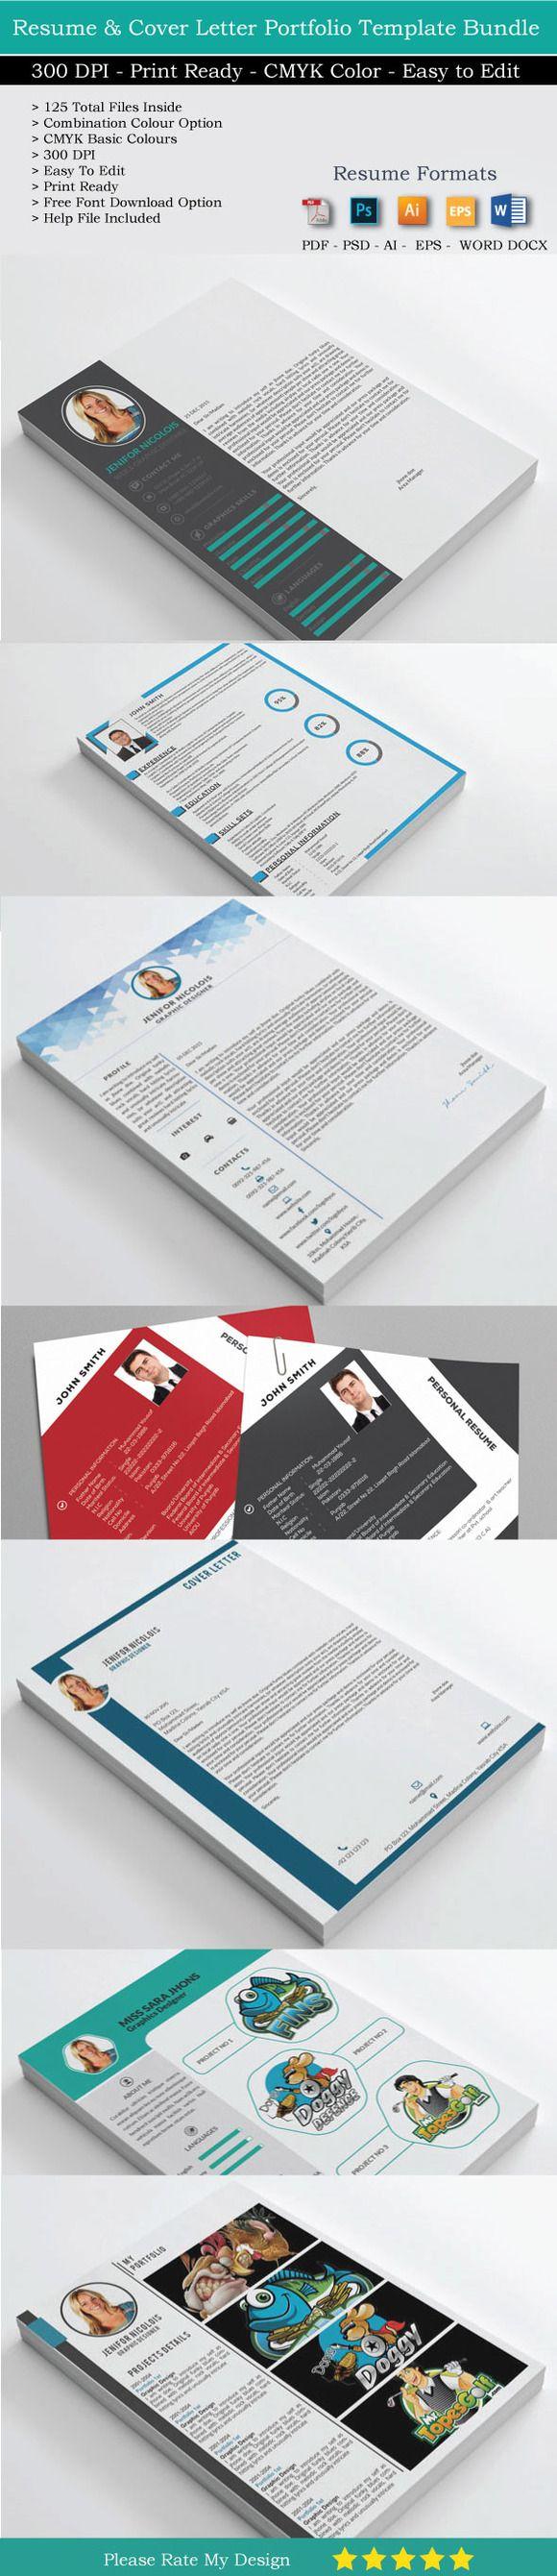 Marketing Resume Objective Statement] Sample Resume For Entry Level ...